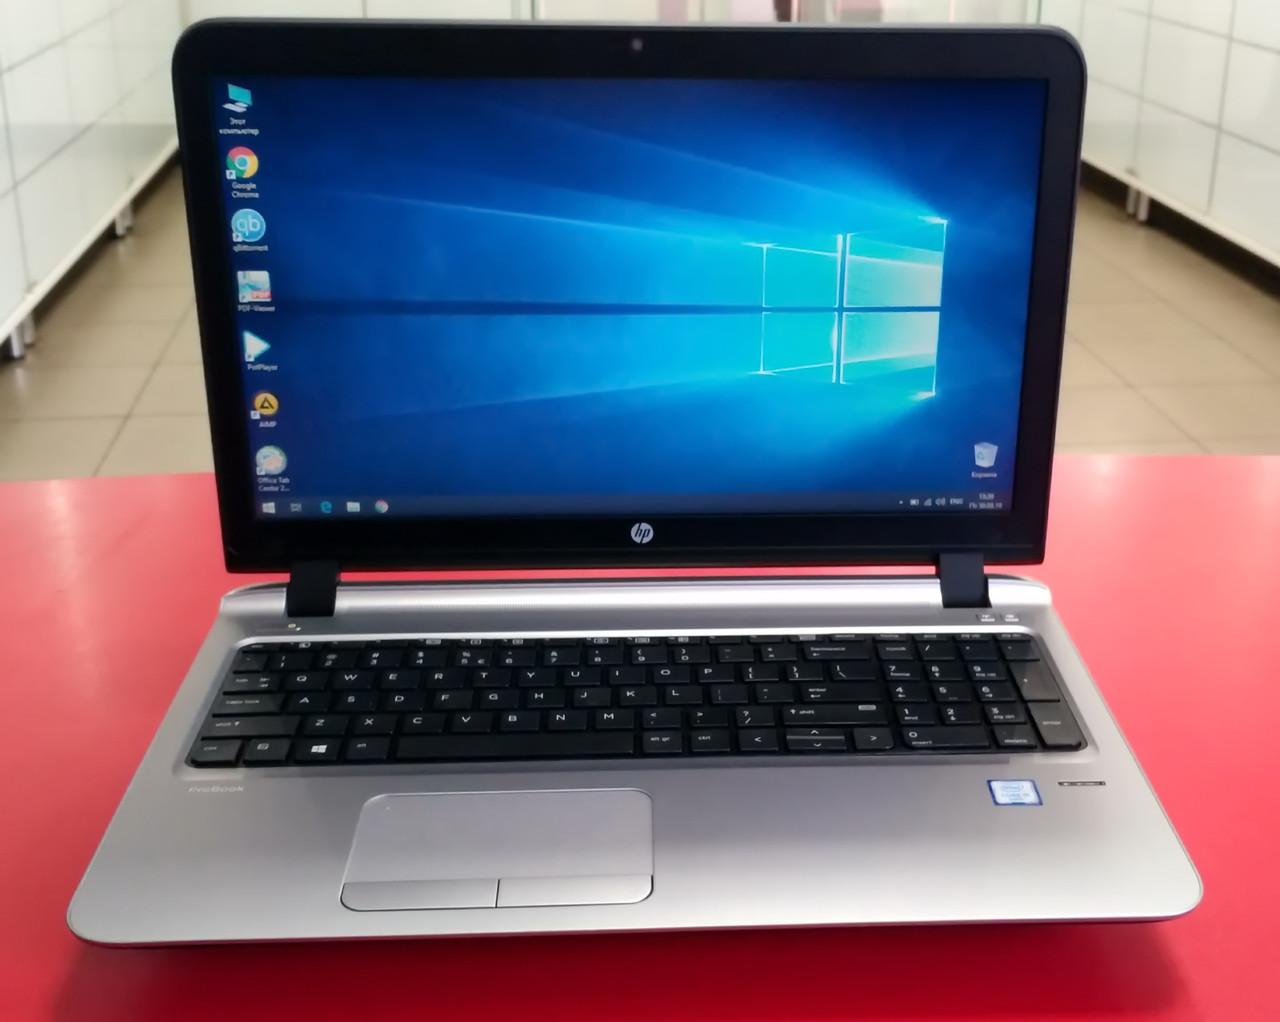 "Ноутбук HP ProBook 450 G3 15.6"" Intel Core i5 2.3 GHz 4 GB RAM 320 HDD Black-Silver Б/У"